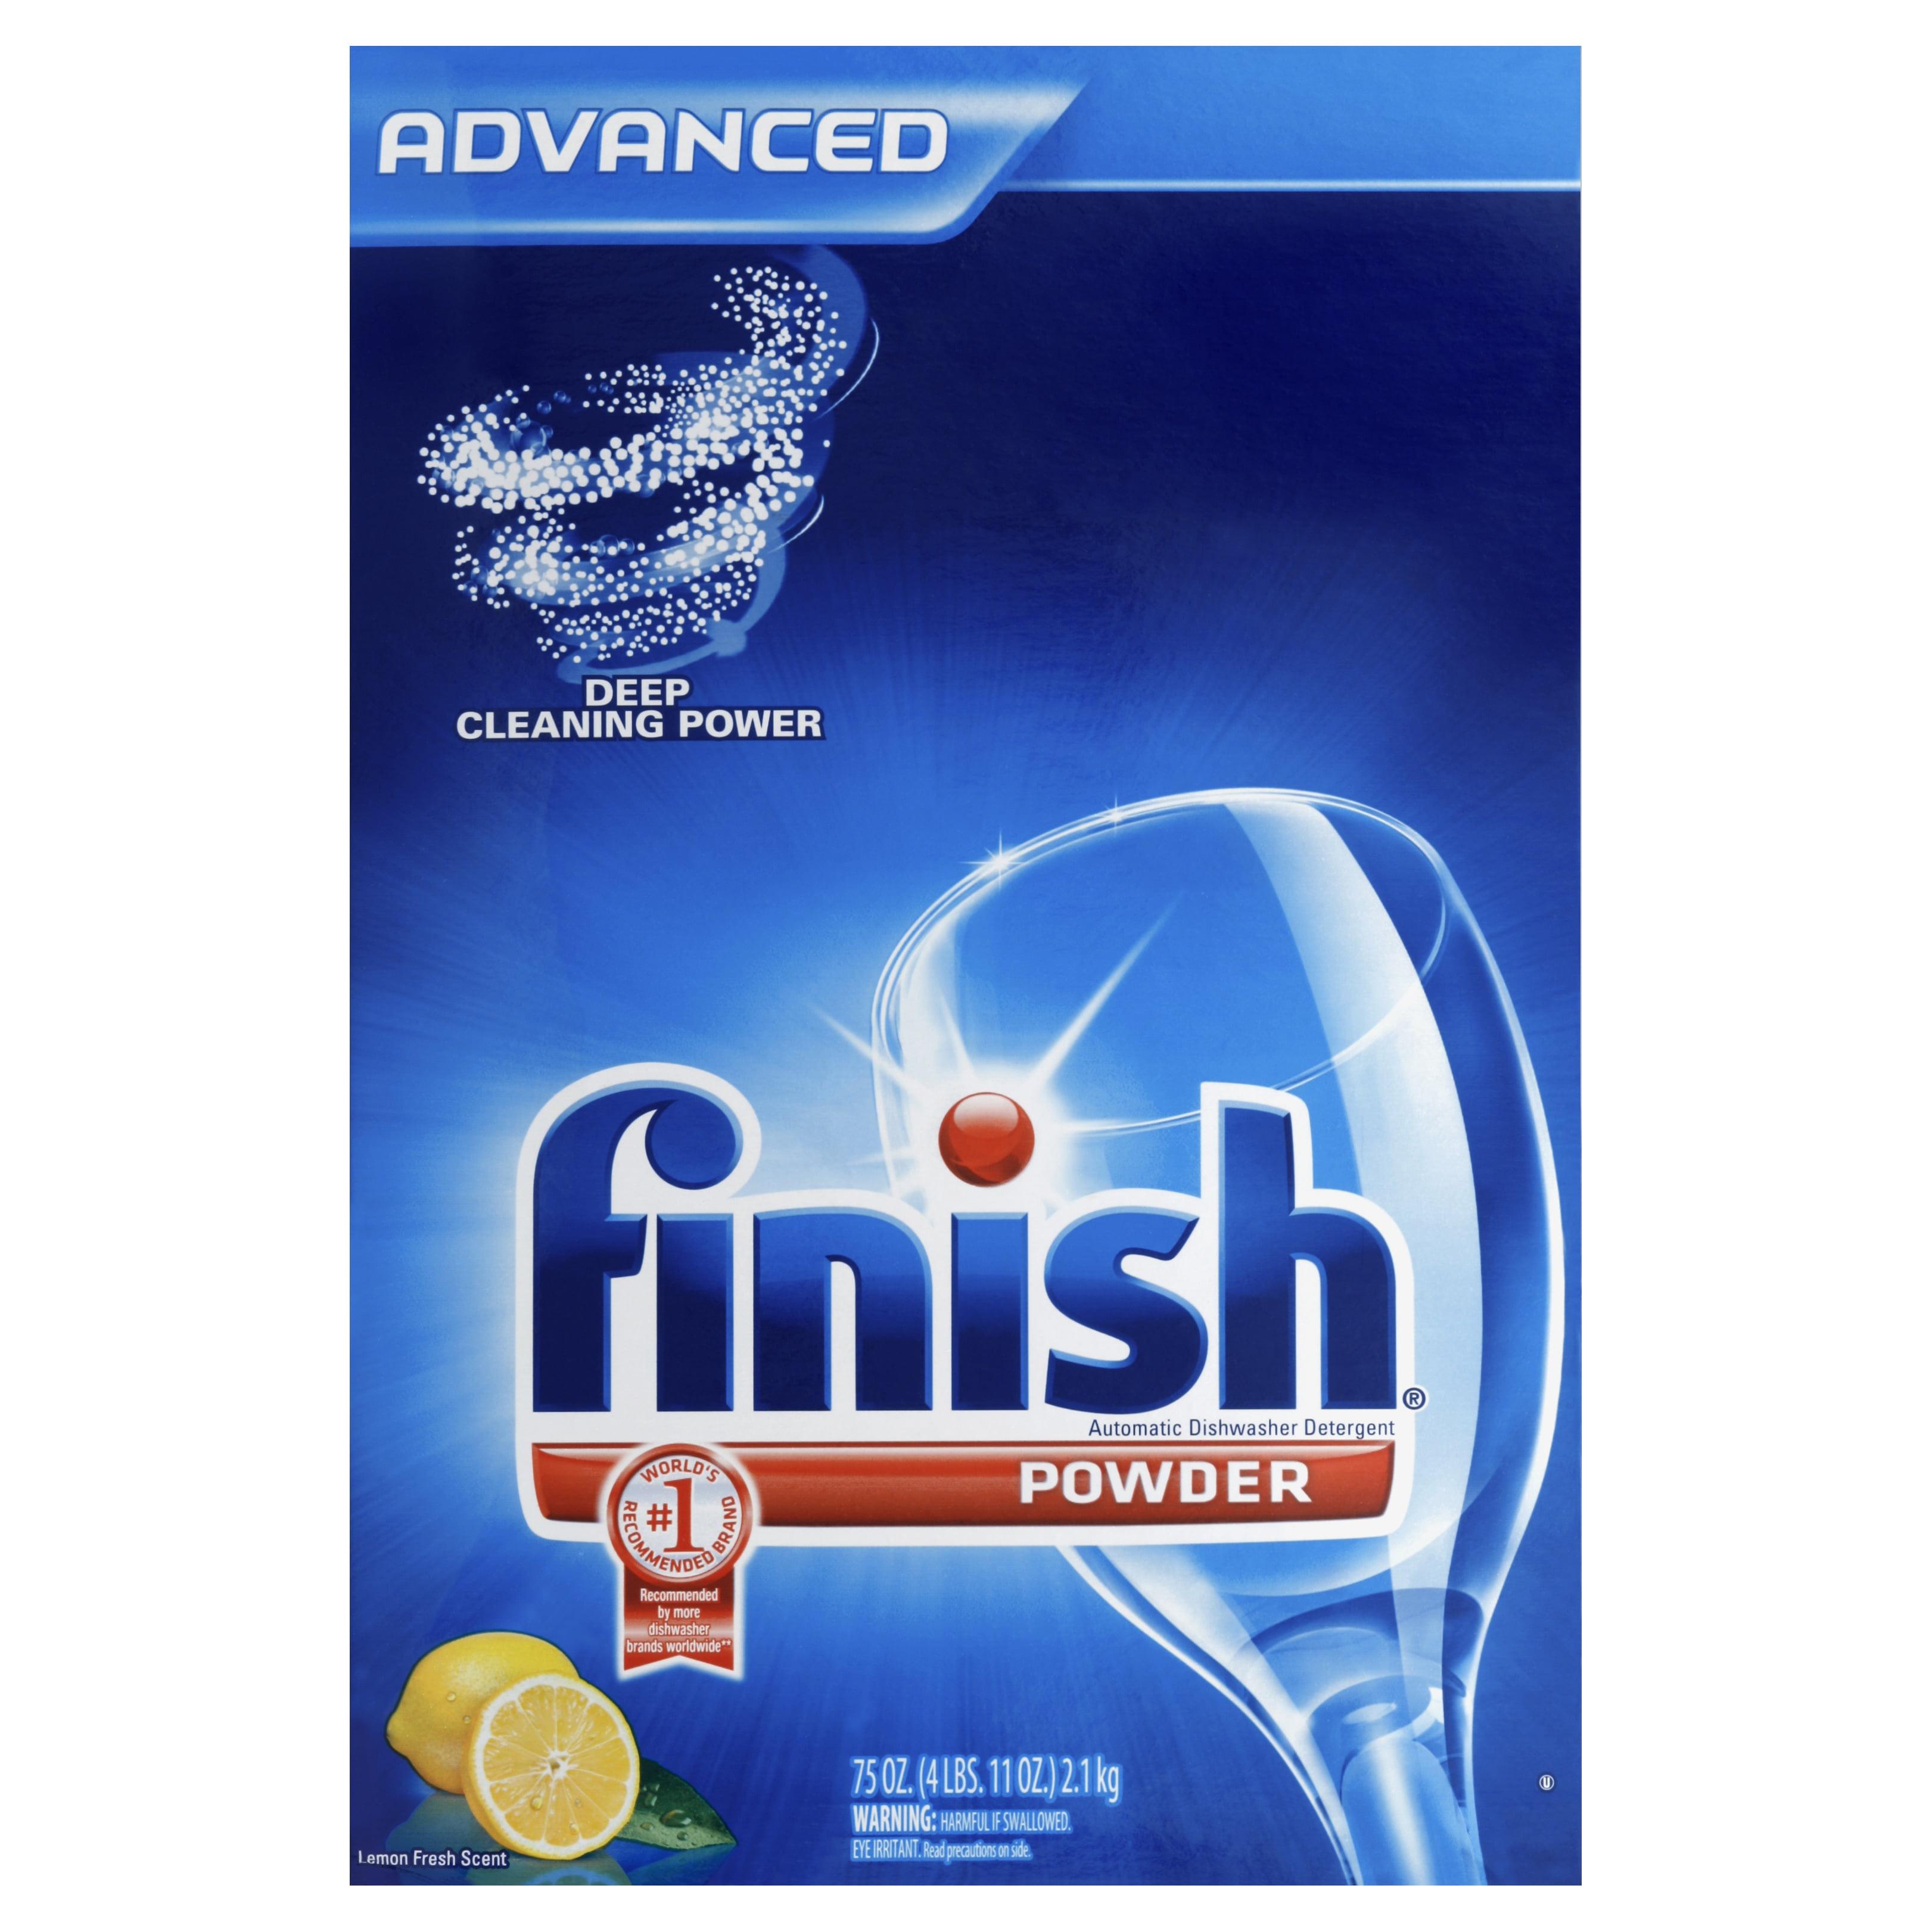 Finish Powder Dishwasher Detergent, Lemon Fresh Scent, 75 Ounce